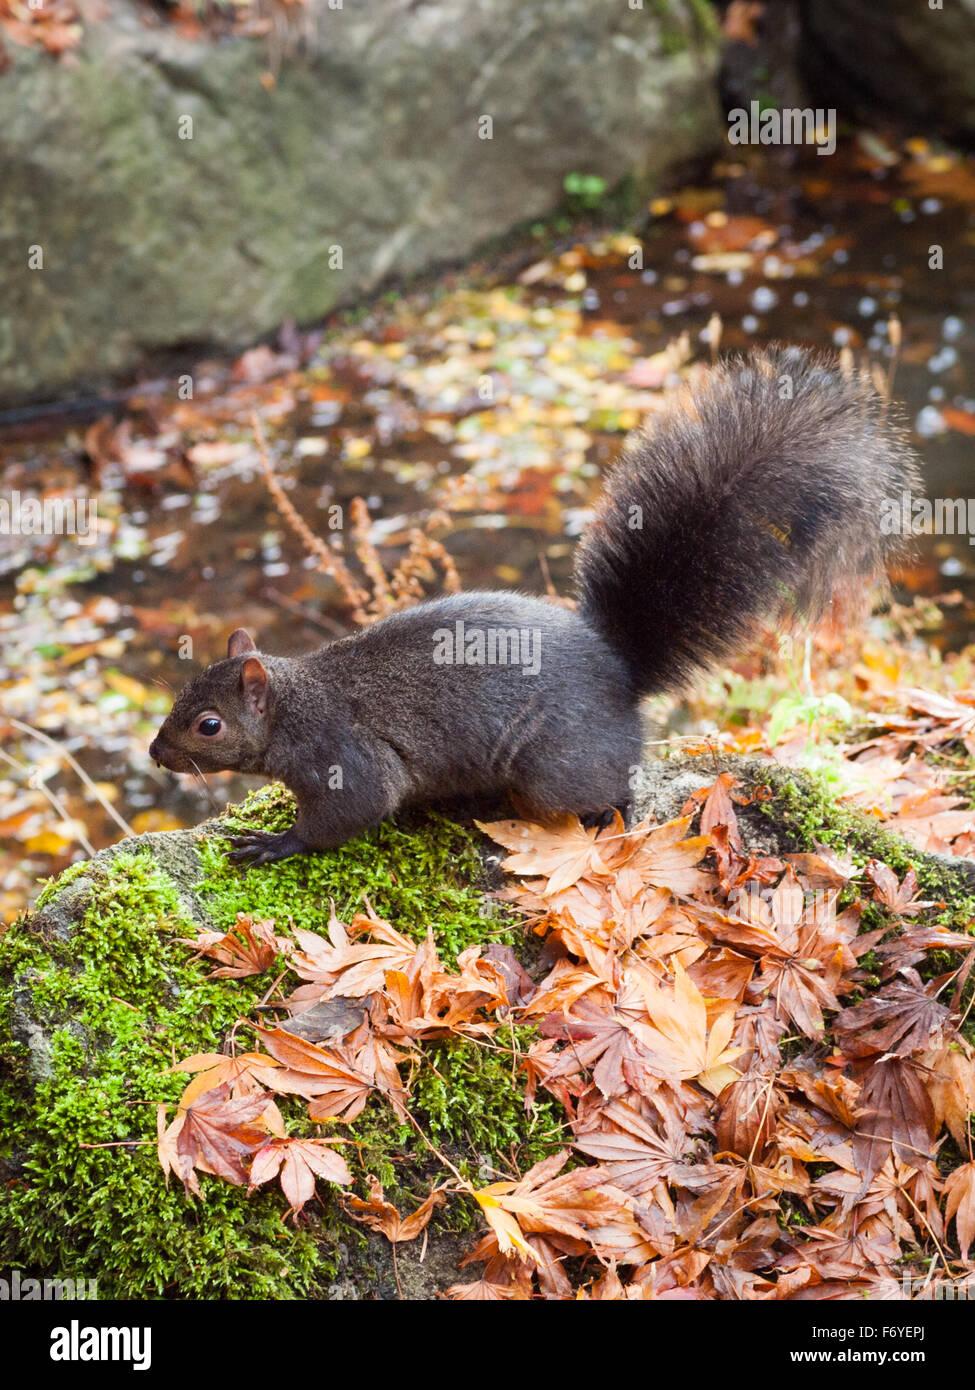 An eastern grey squirrel (Sciurus carolinensis) in Beacon Hill Park in Victoria, British Columbia, Canada. - Stock Image